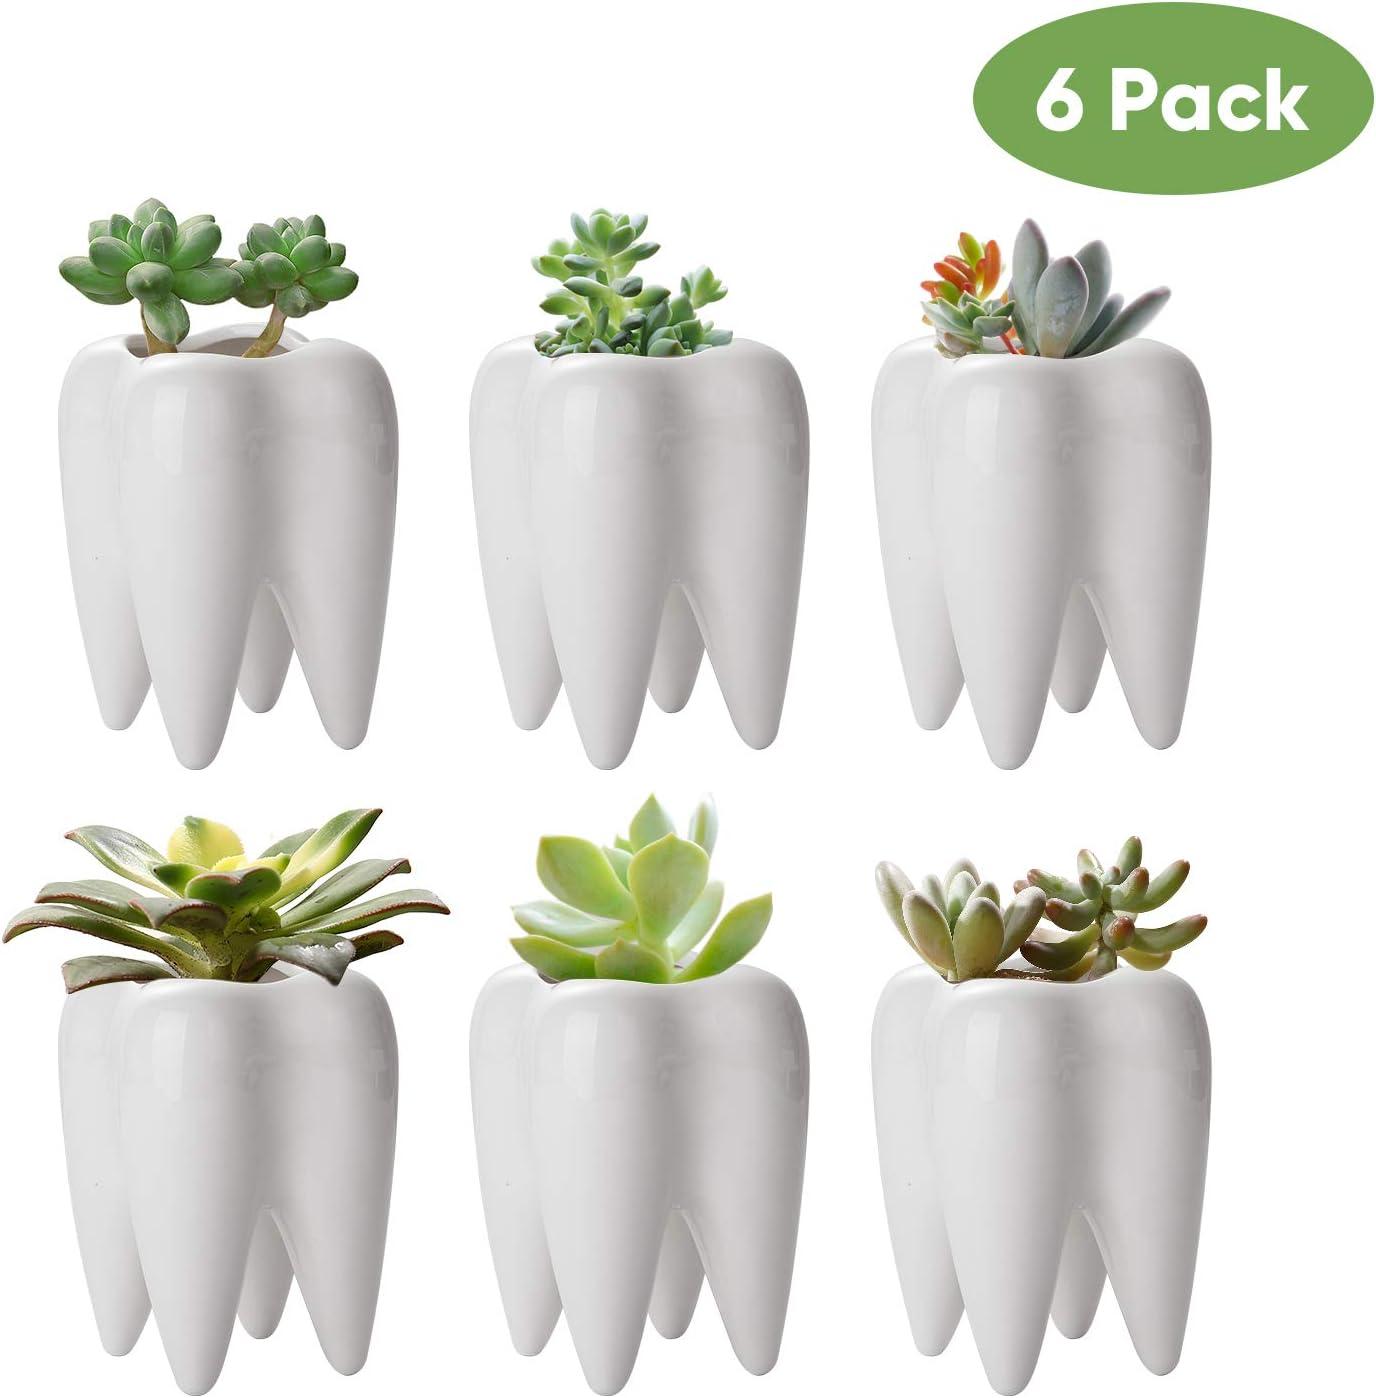 Tooth Shaped Planter Pots,Small Ceramic Succulent Pots,Cute White Cactus Planters,Mini Flower Plant Containers, Creative Pen Pencil Holder for Desk Decor 6 Pack